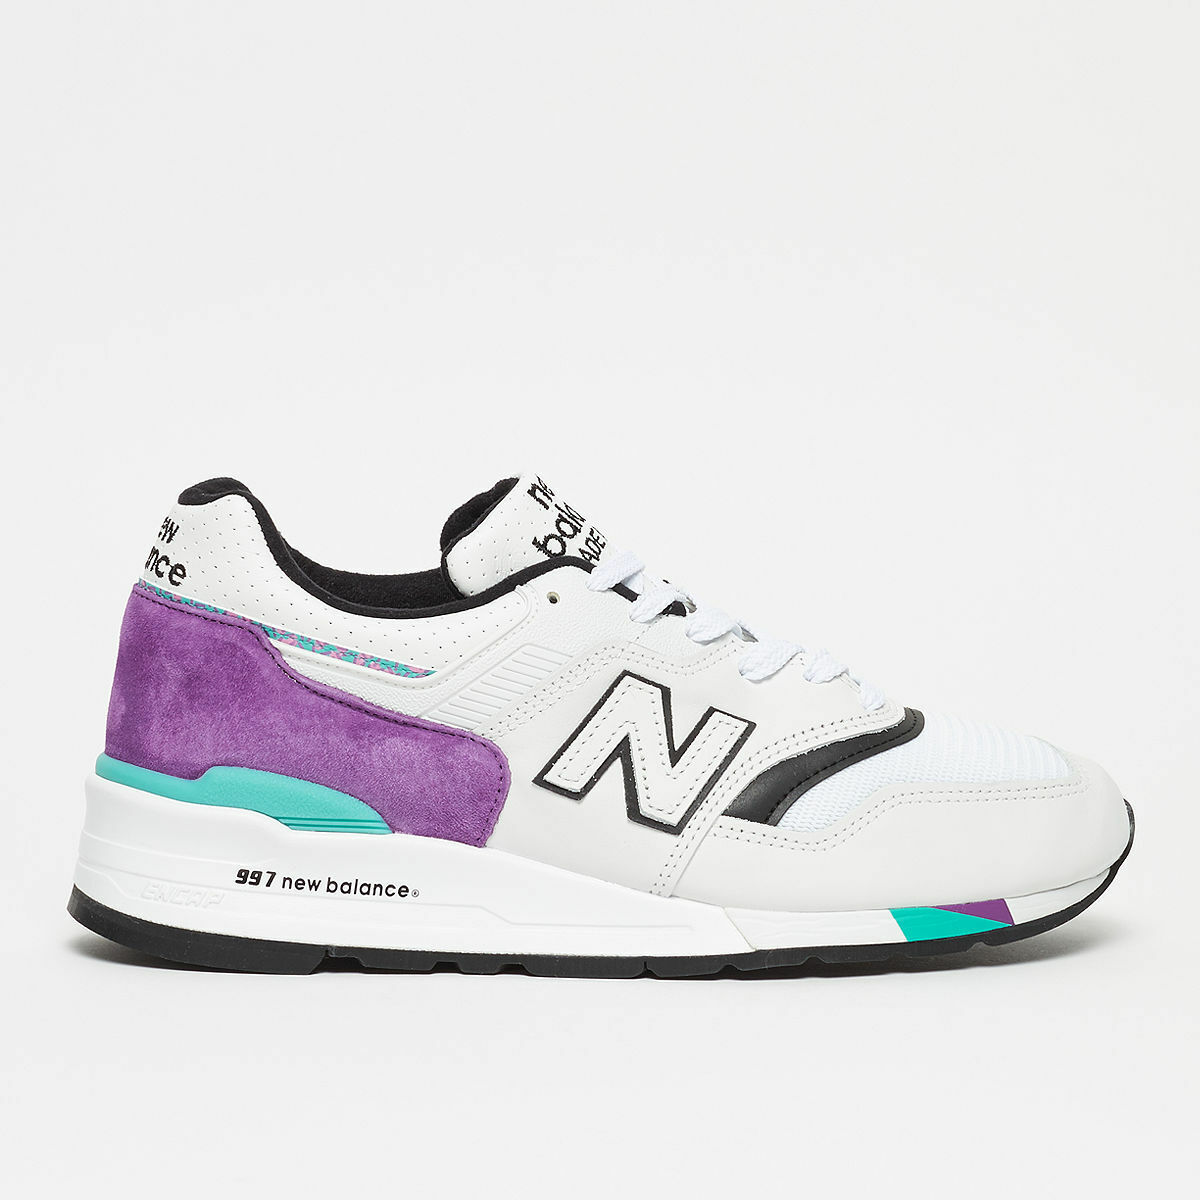 New balance M997WEA Jogging Shoe WHITE GRAPE Uomo US SIZES M997WEA